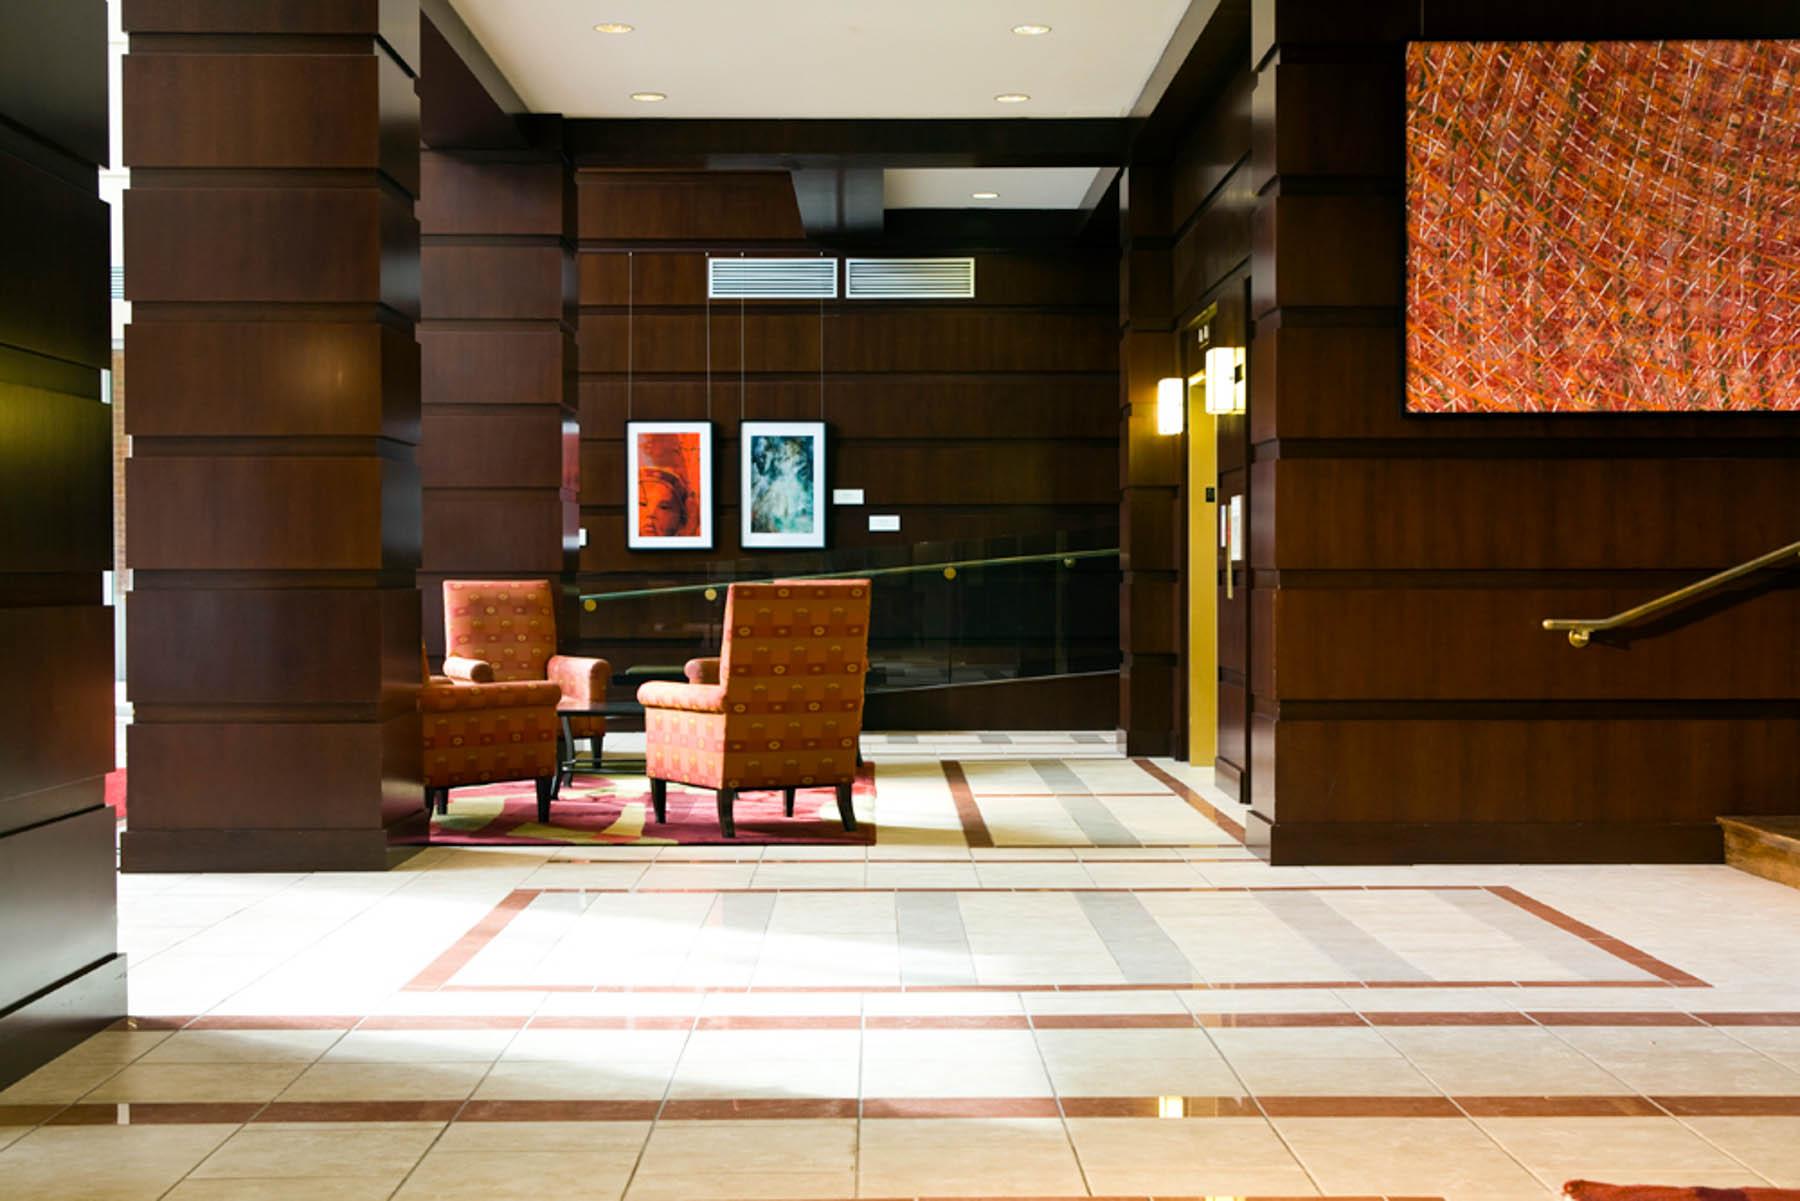 В отеле Marriott (Courtesy of Marriott Hotels)